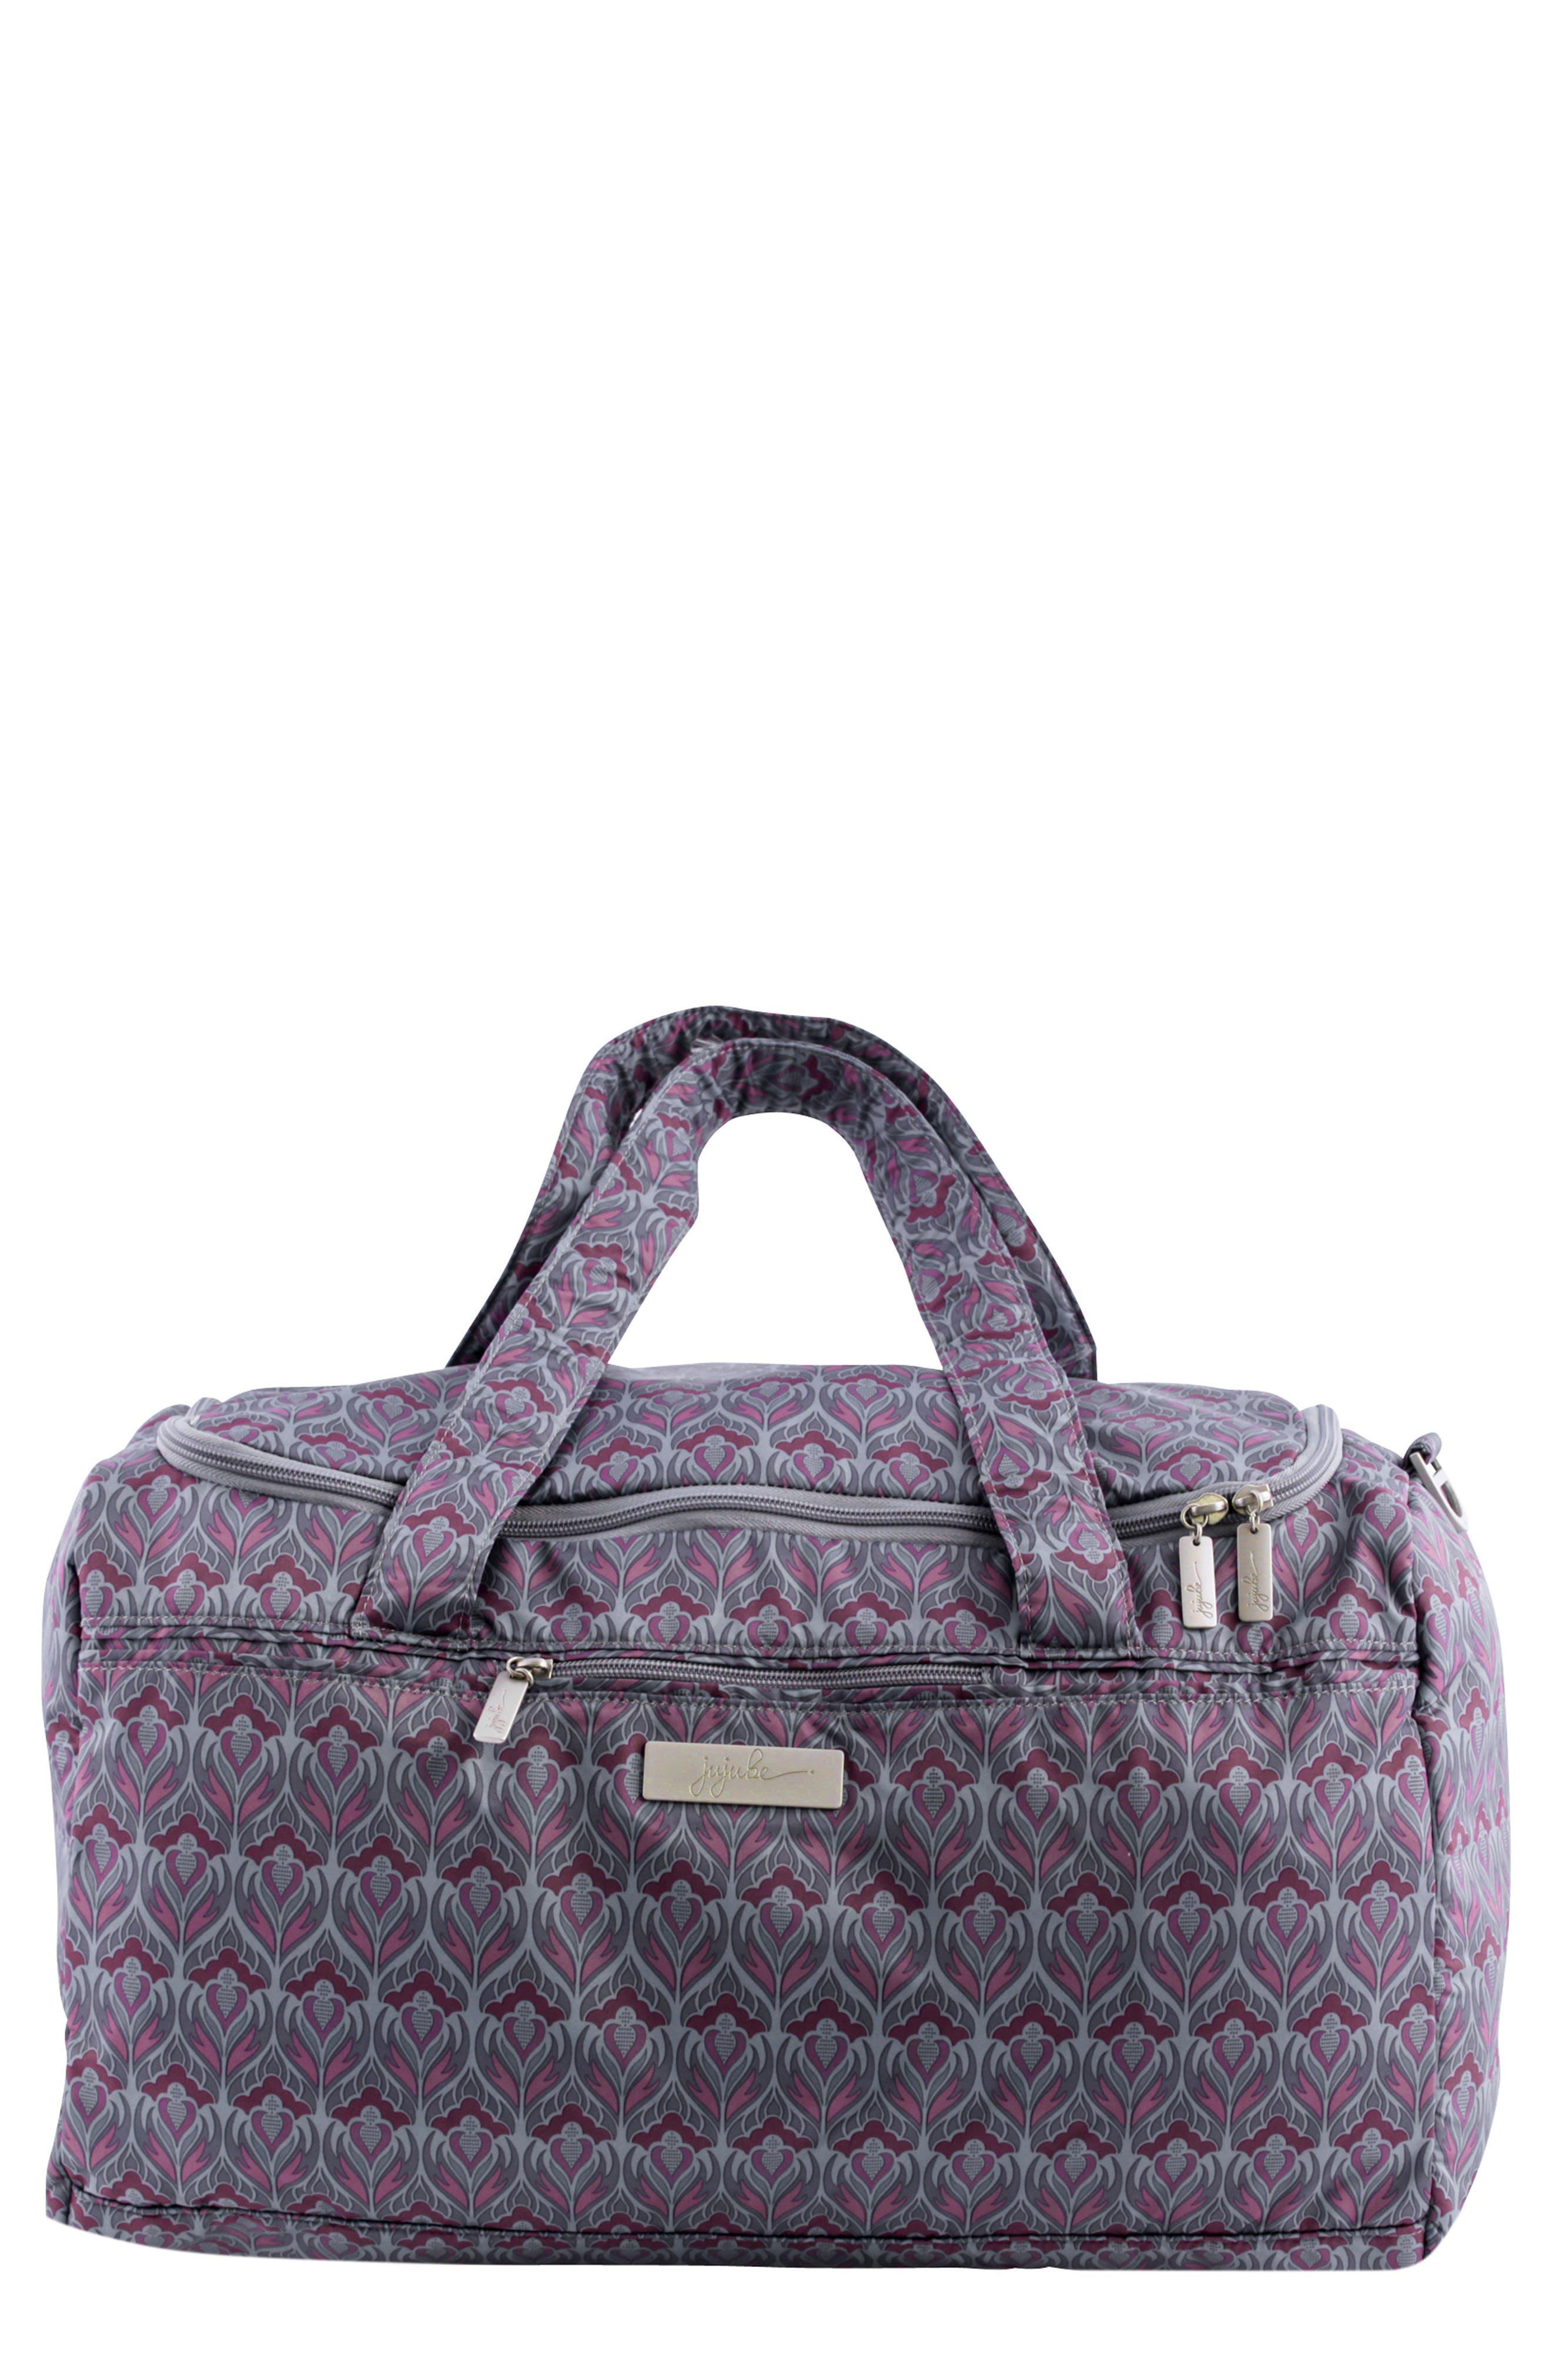 'Starlet' Travel Diaper Bag,                             Main thumbnail 1, color,                             Amethyst Ice